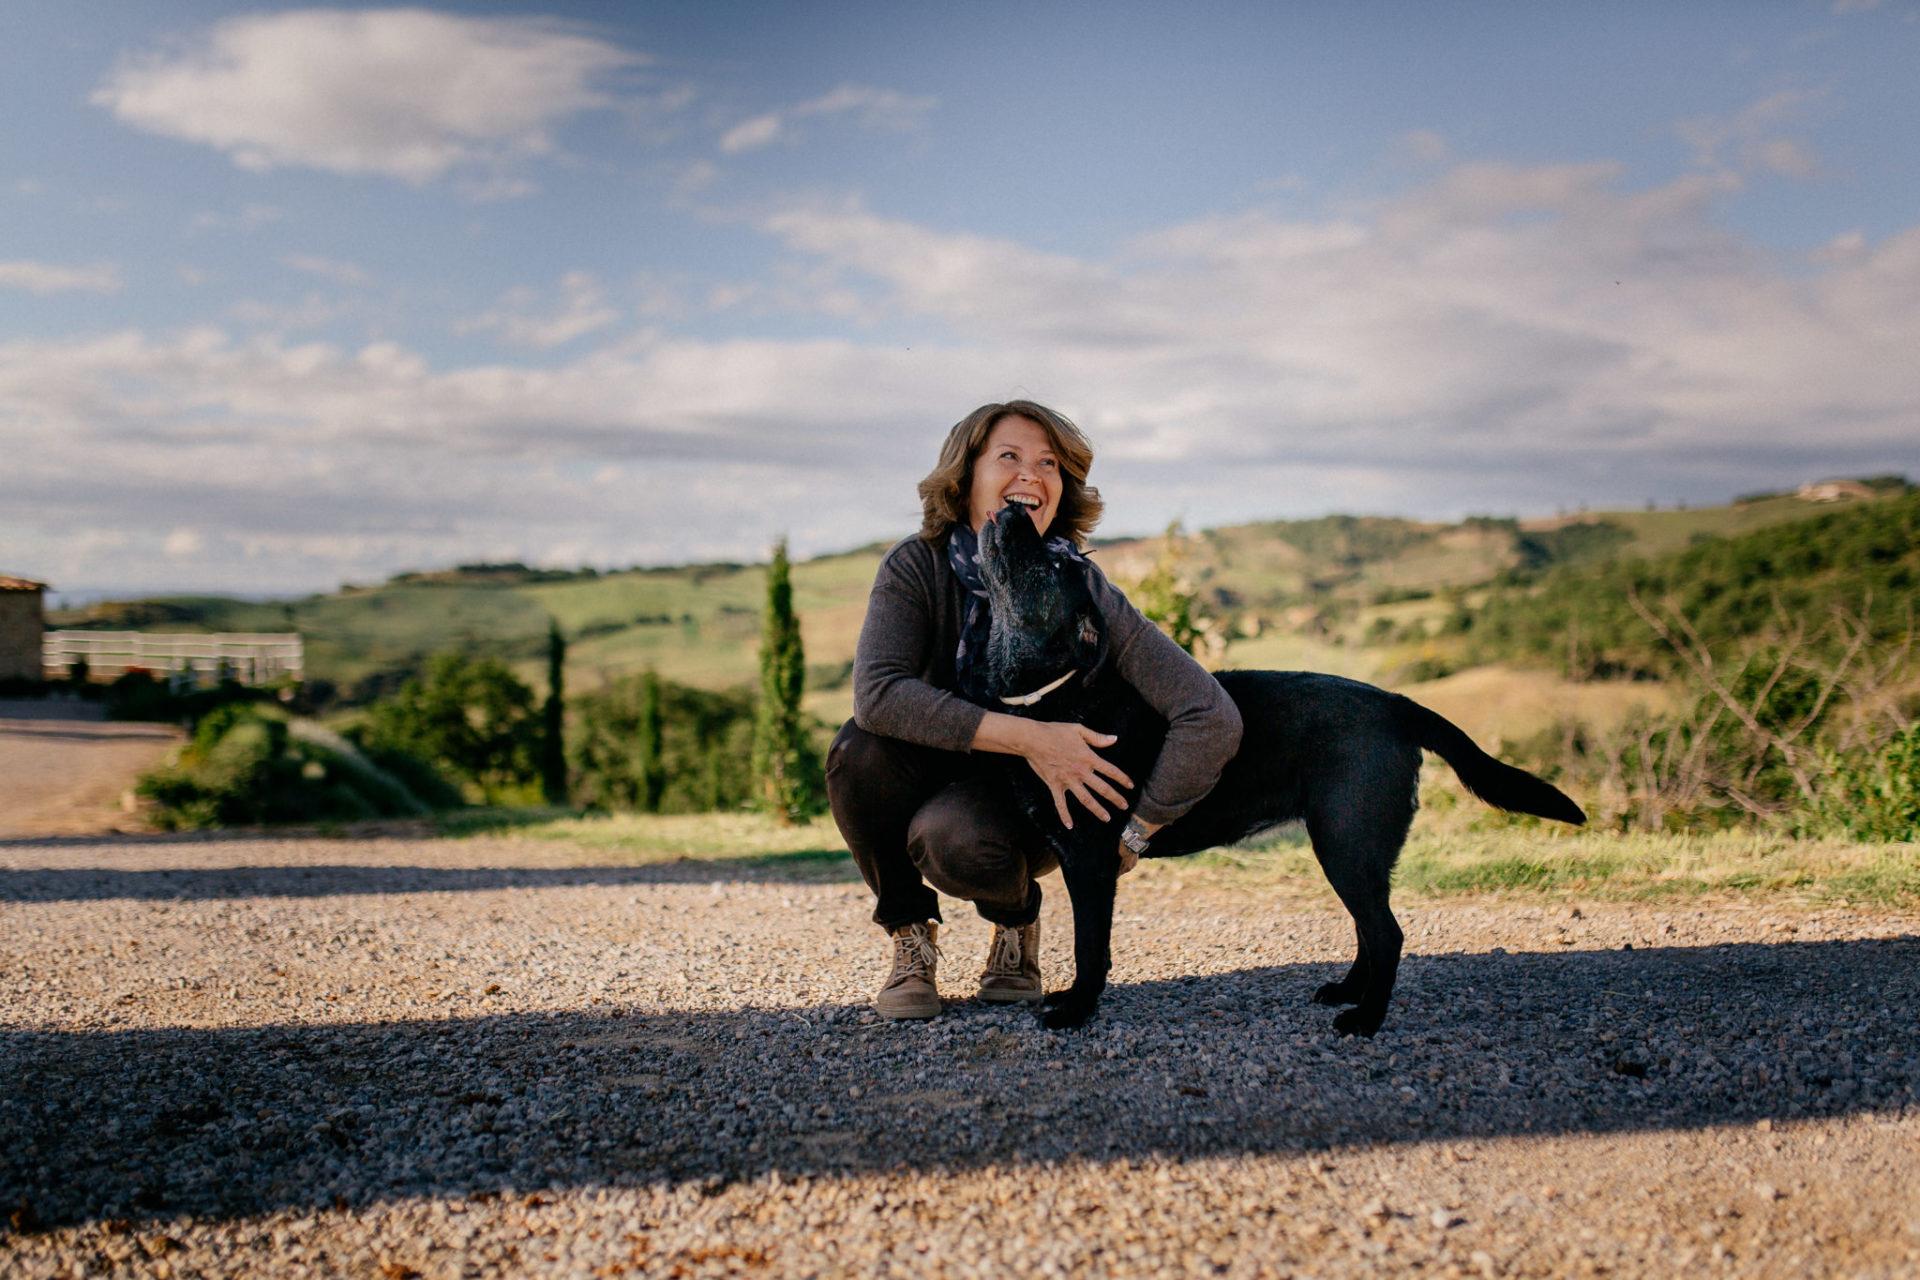 family photos holiday tuscany-dimora santa margherita-intimate portrait-family photographer stuttgart-labrador family dog